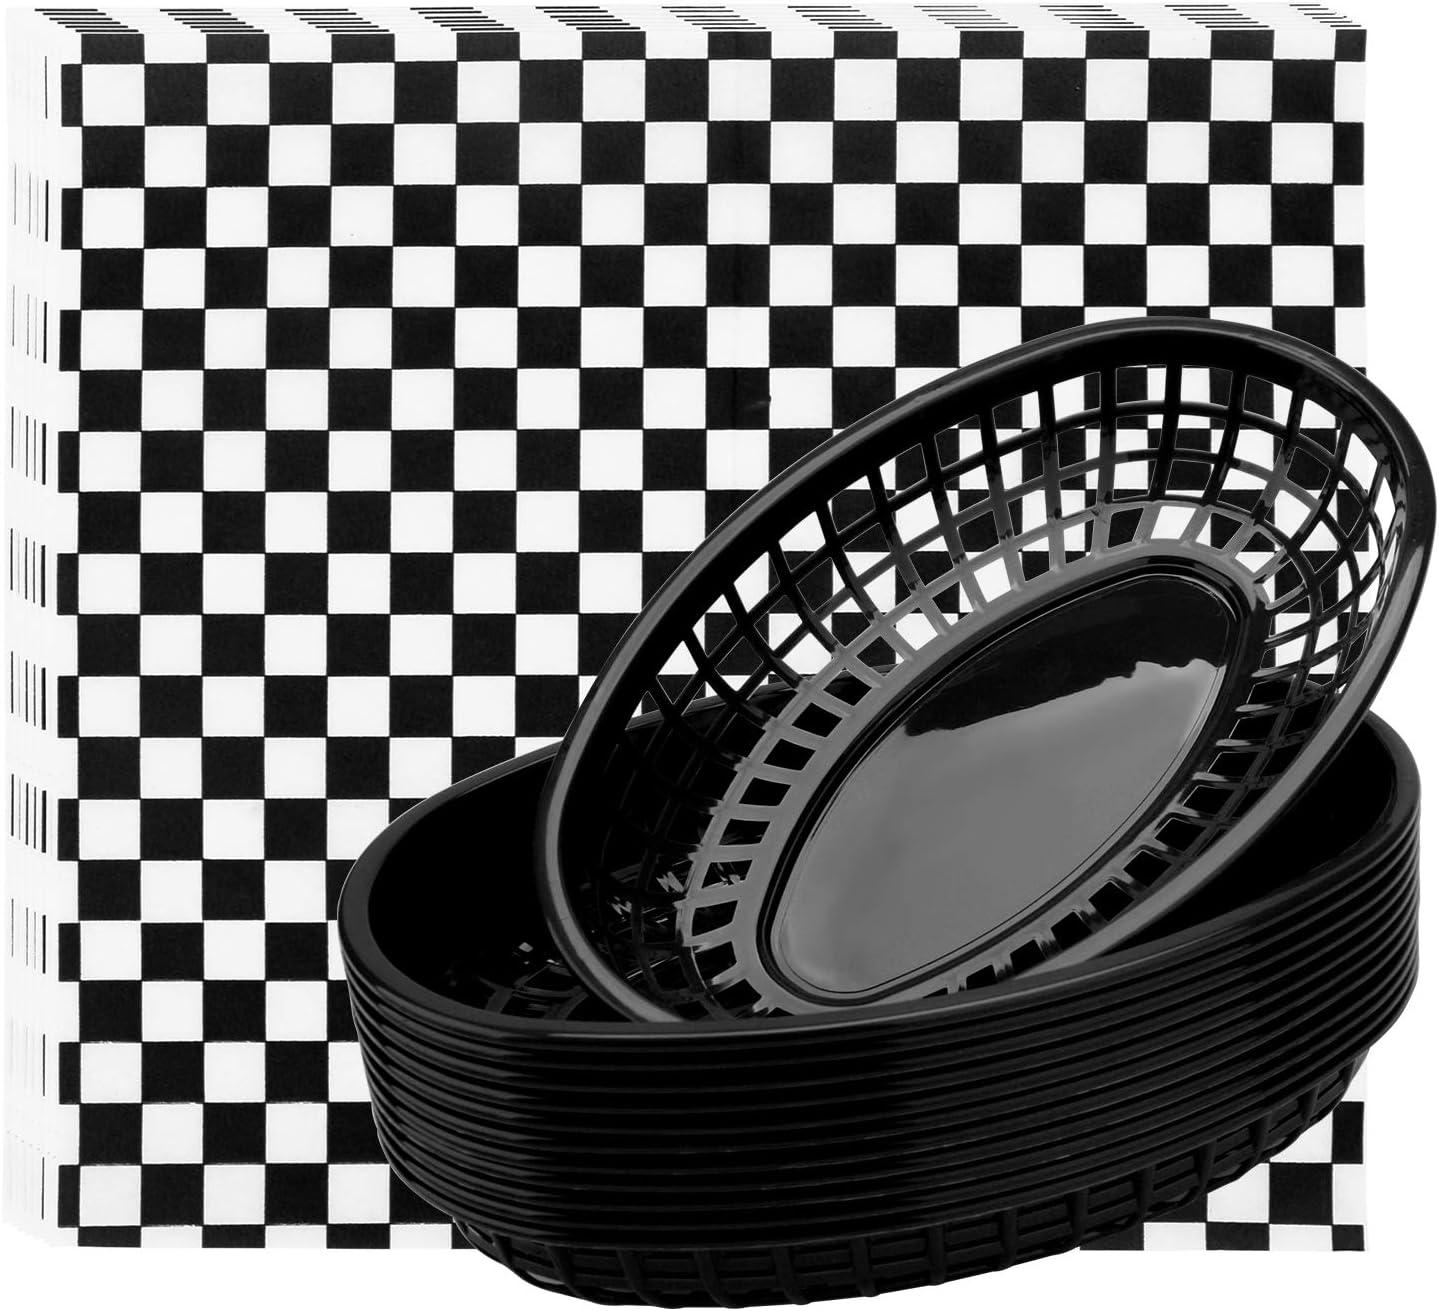 Burger Baskets & Paper Liners, Eusoar 100pcs Wax Deli Paper and 12 pcs Food Baskets Serving Tray Setsfor Restaurant Supplies, Deli Serving, Chicken, Burgers&Fries